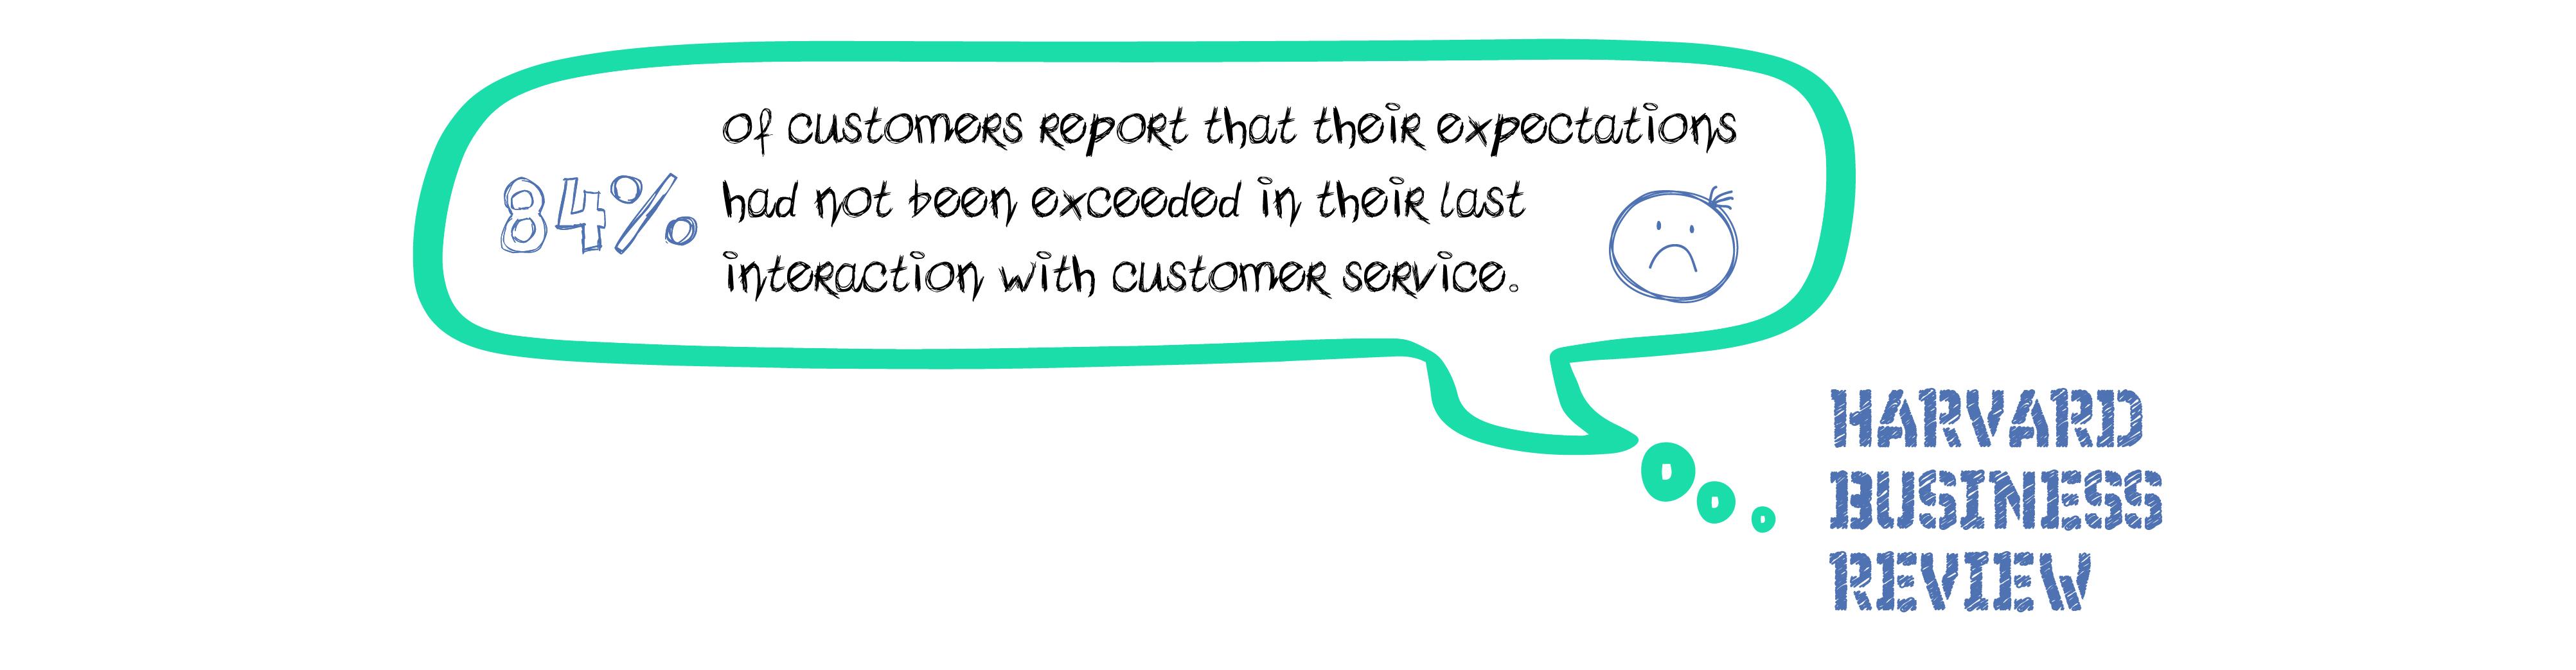 Customer service HBR